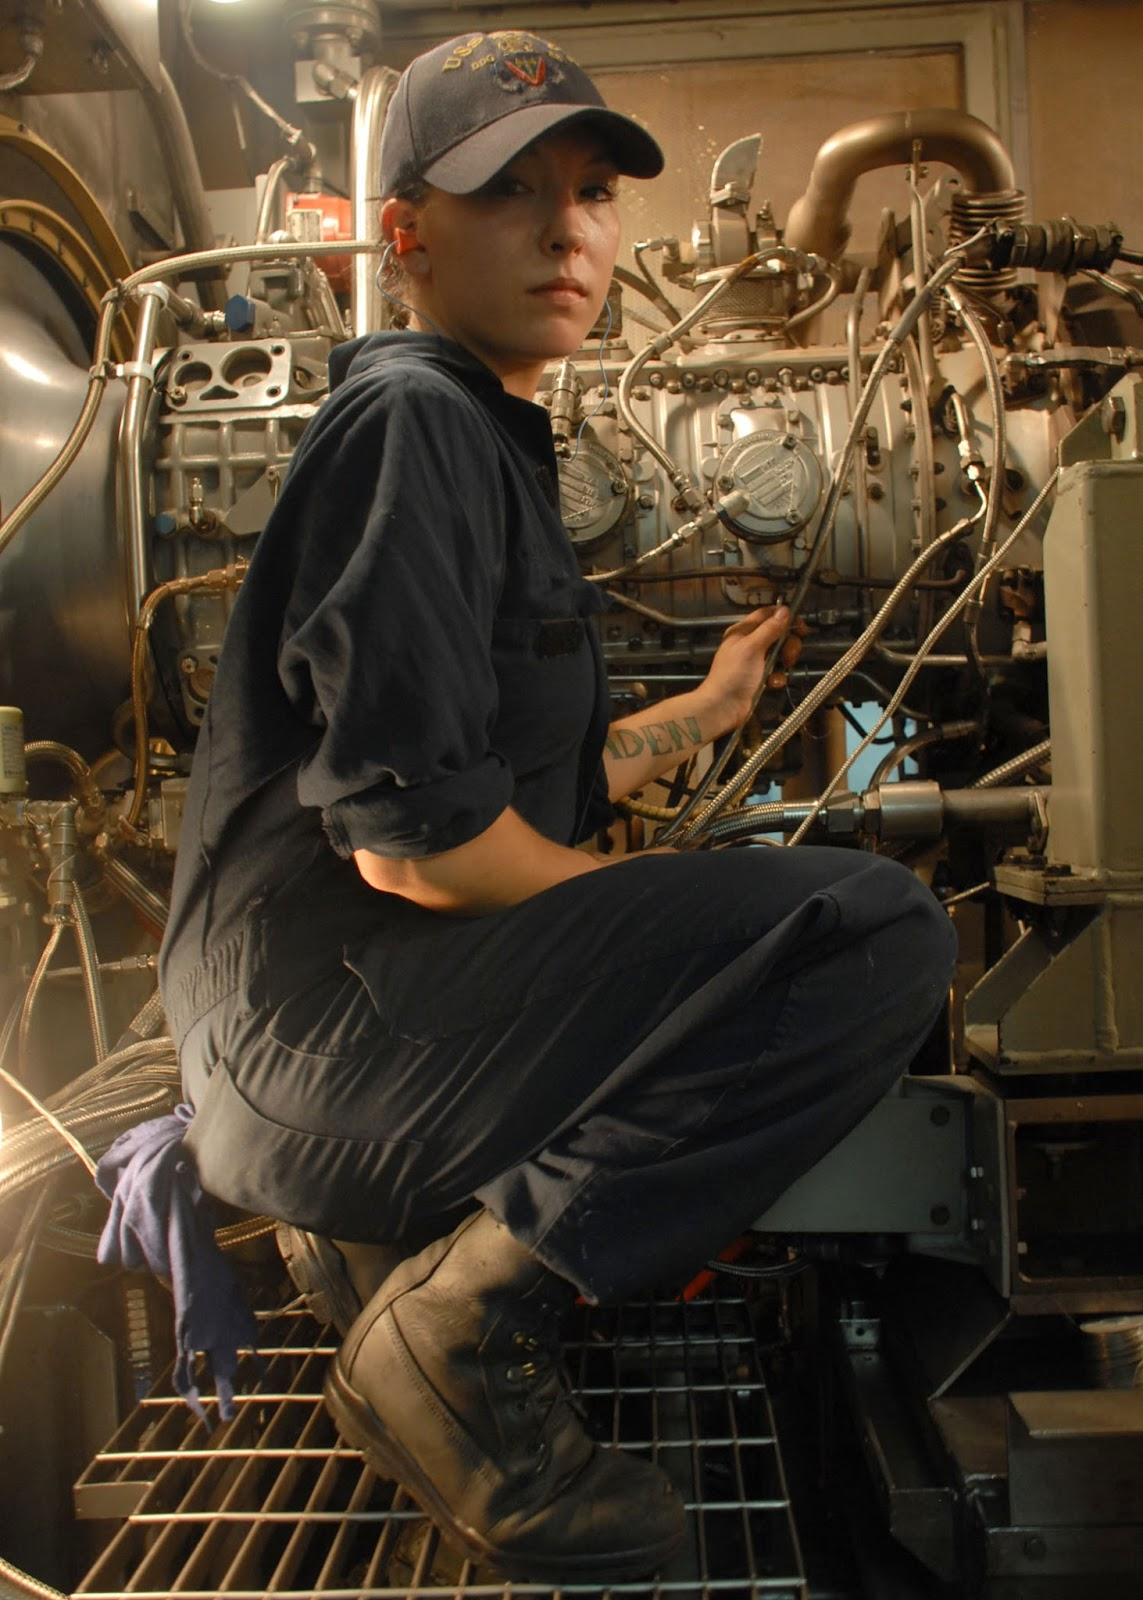 Battleship Engine Room: Pergelator: August 2013